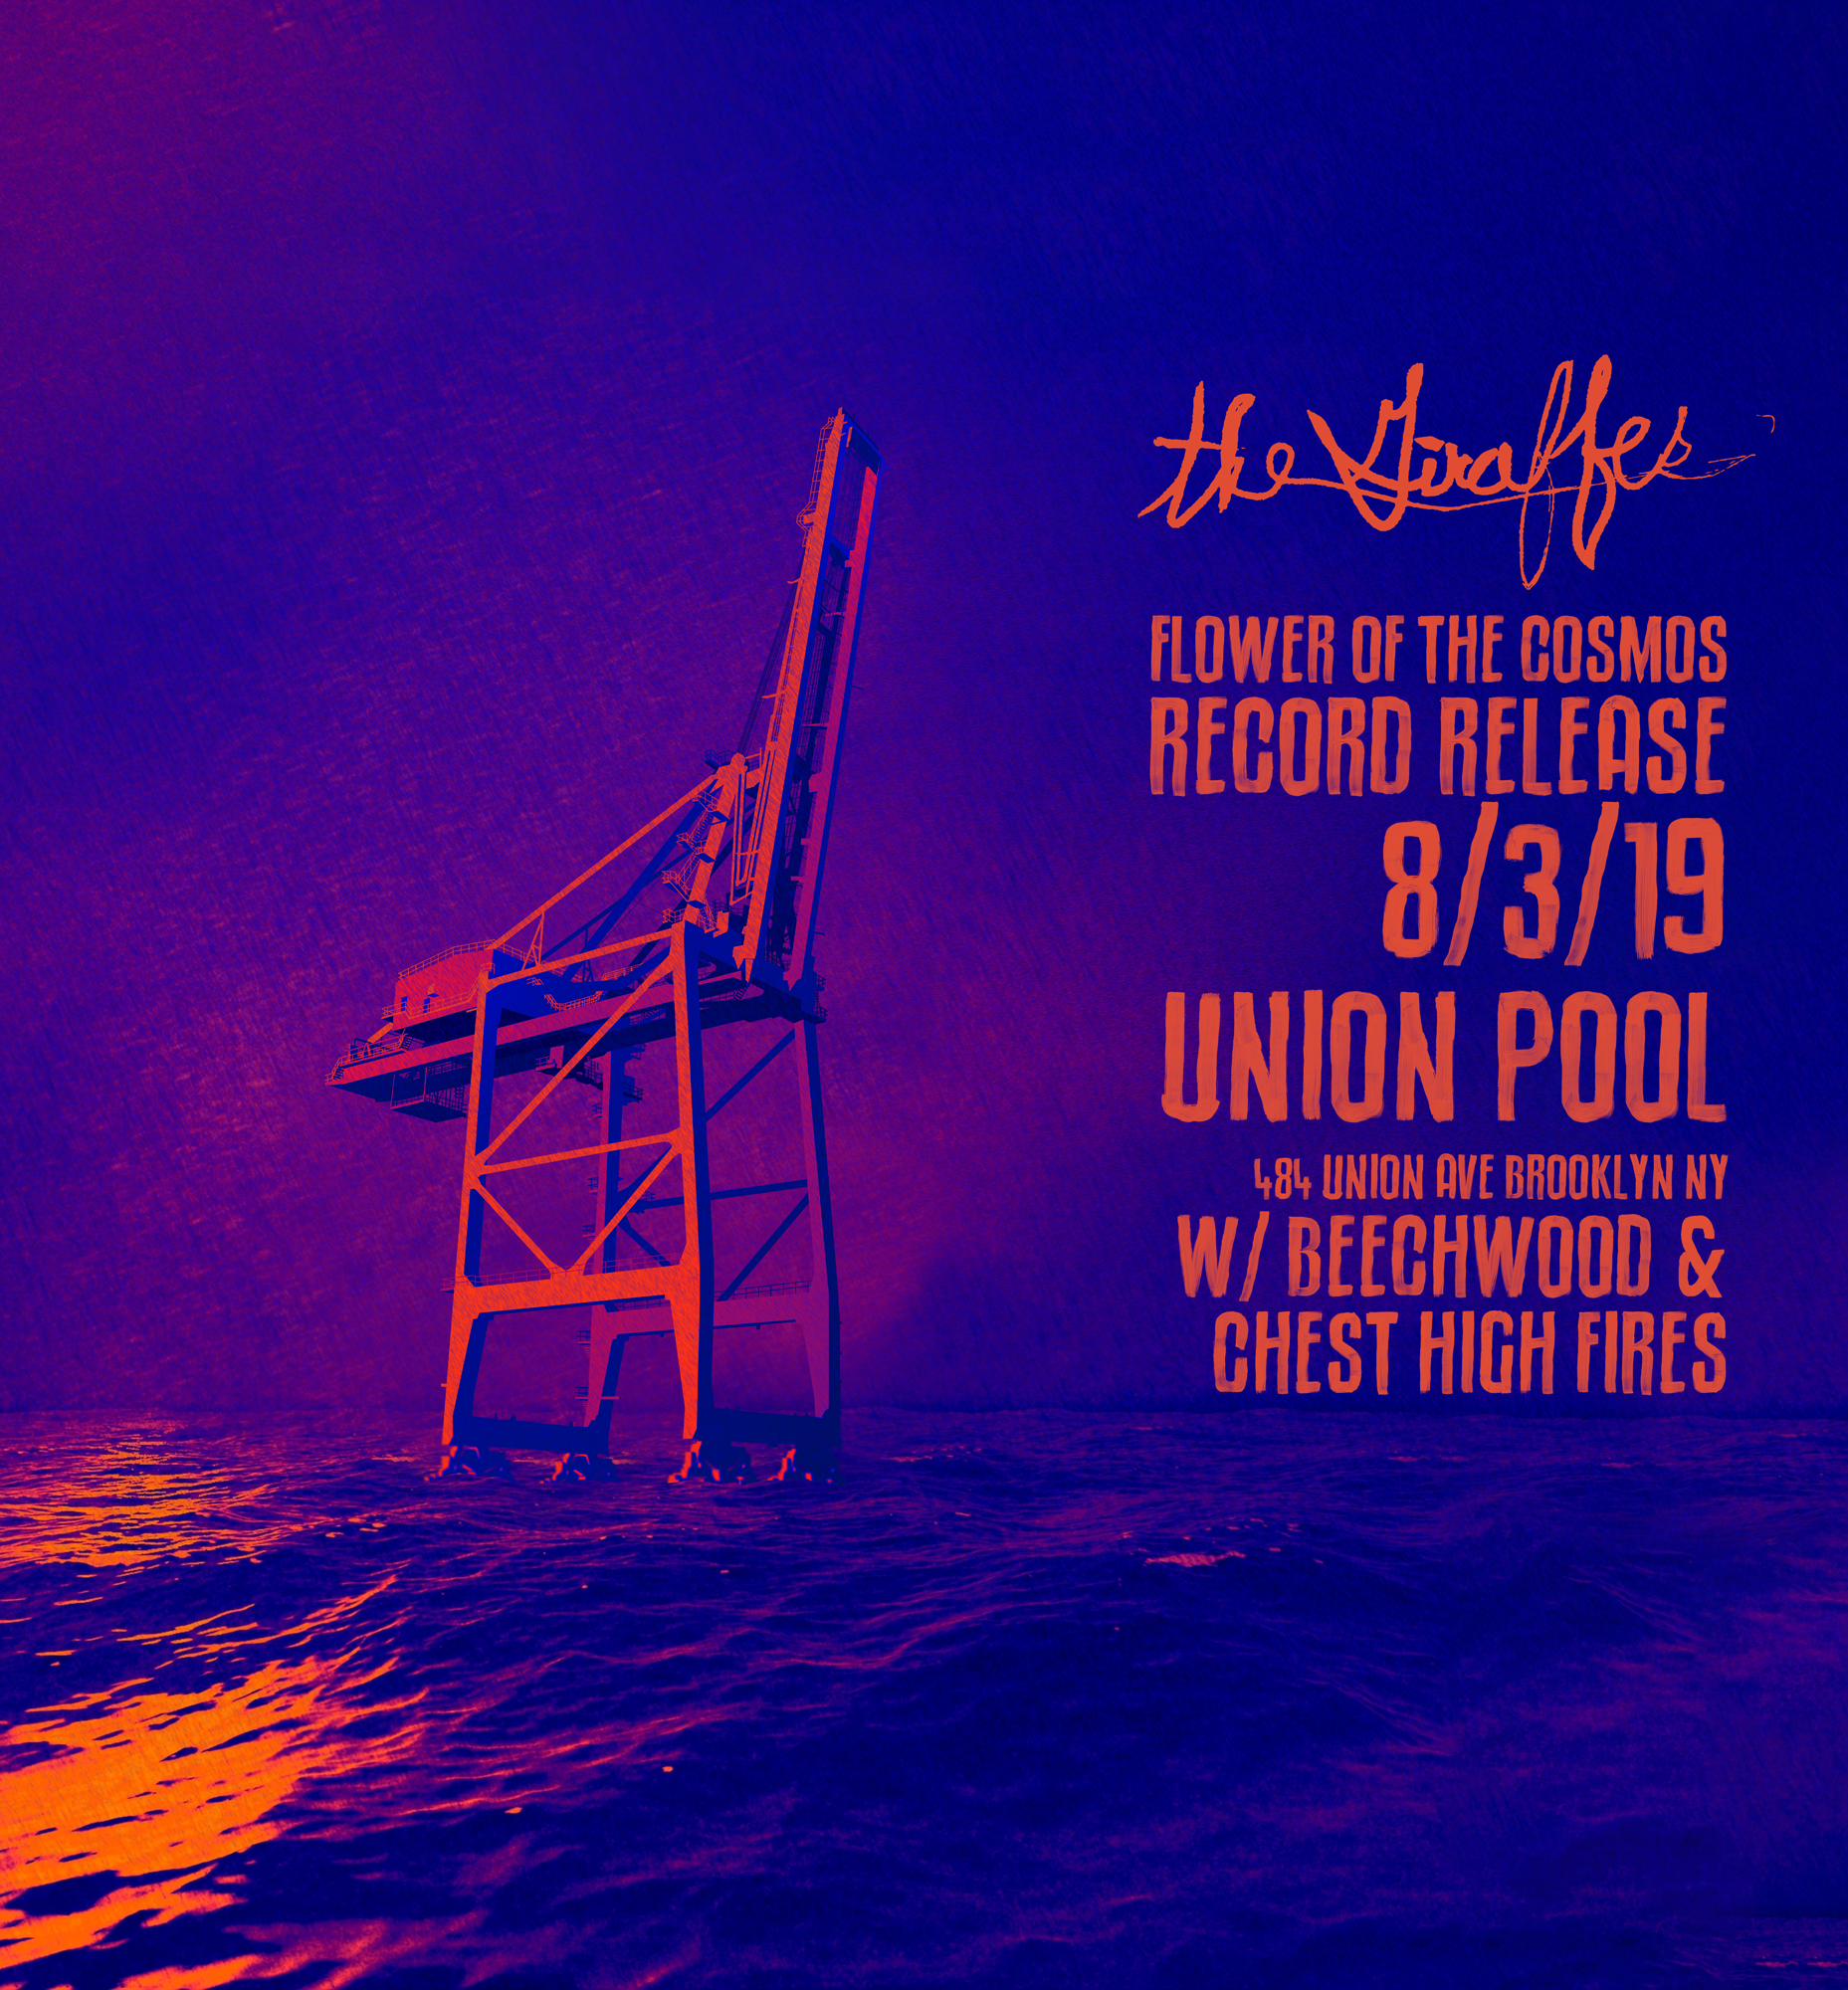 Union-Pool-Flier-7-1-19.png